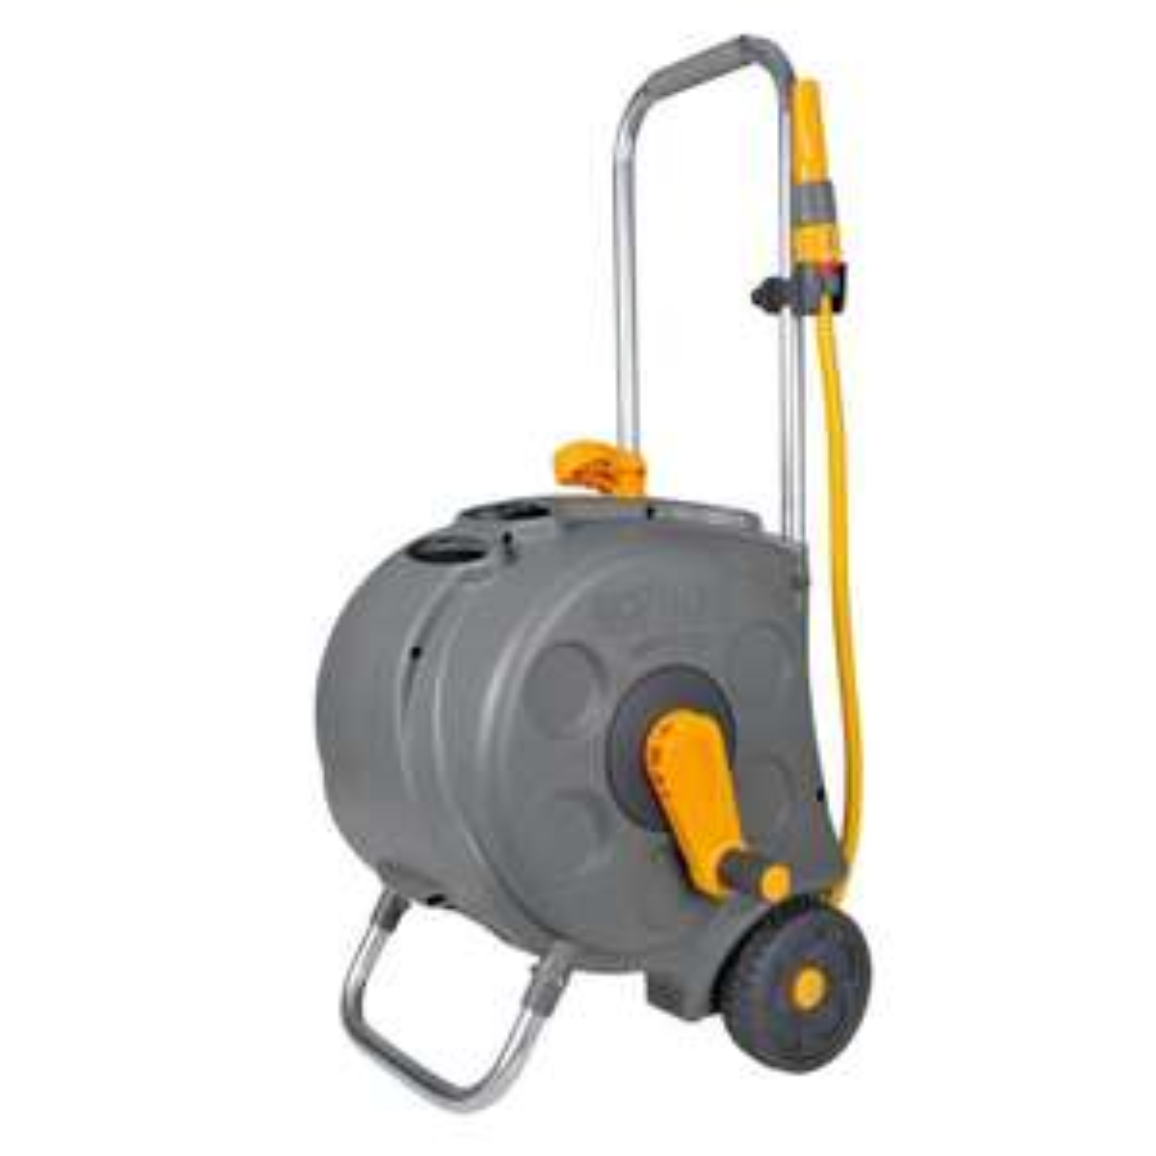 Bq deals sales for june 2018 hotukdeals hozelock compact hose reel hose cart l30 m 28 solutioingenieria Choice Image